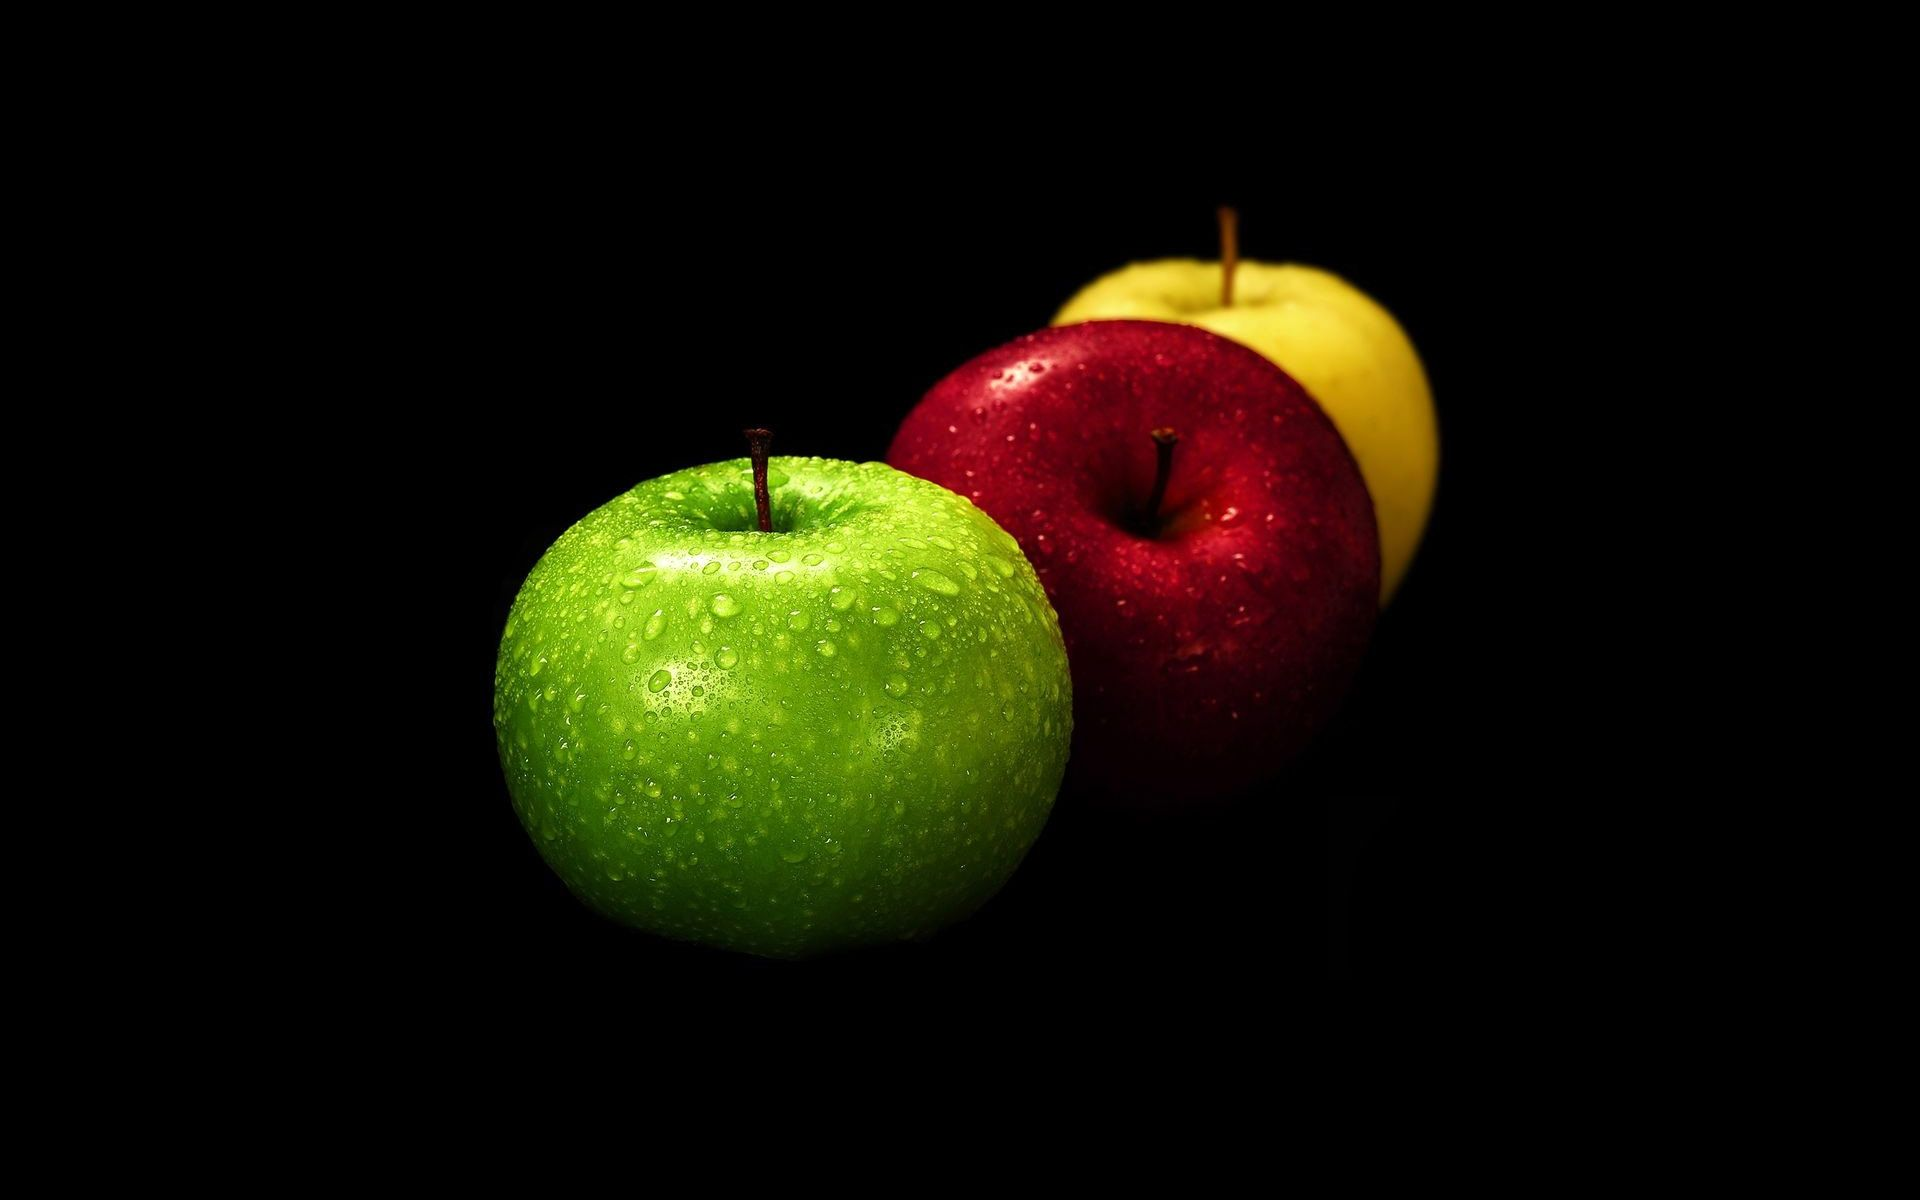 Apples Desktop Wallpapers Free On Latoro Com Apple Picture Apple Yellow Apple